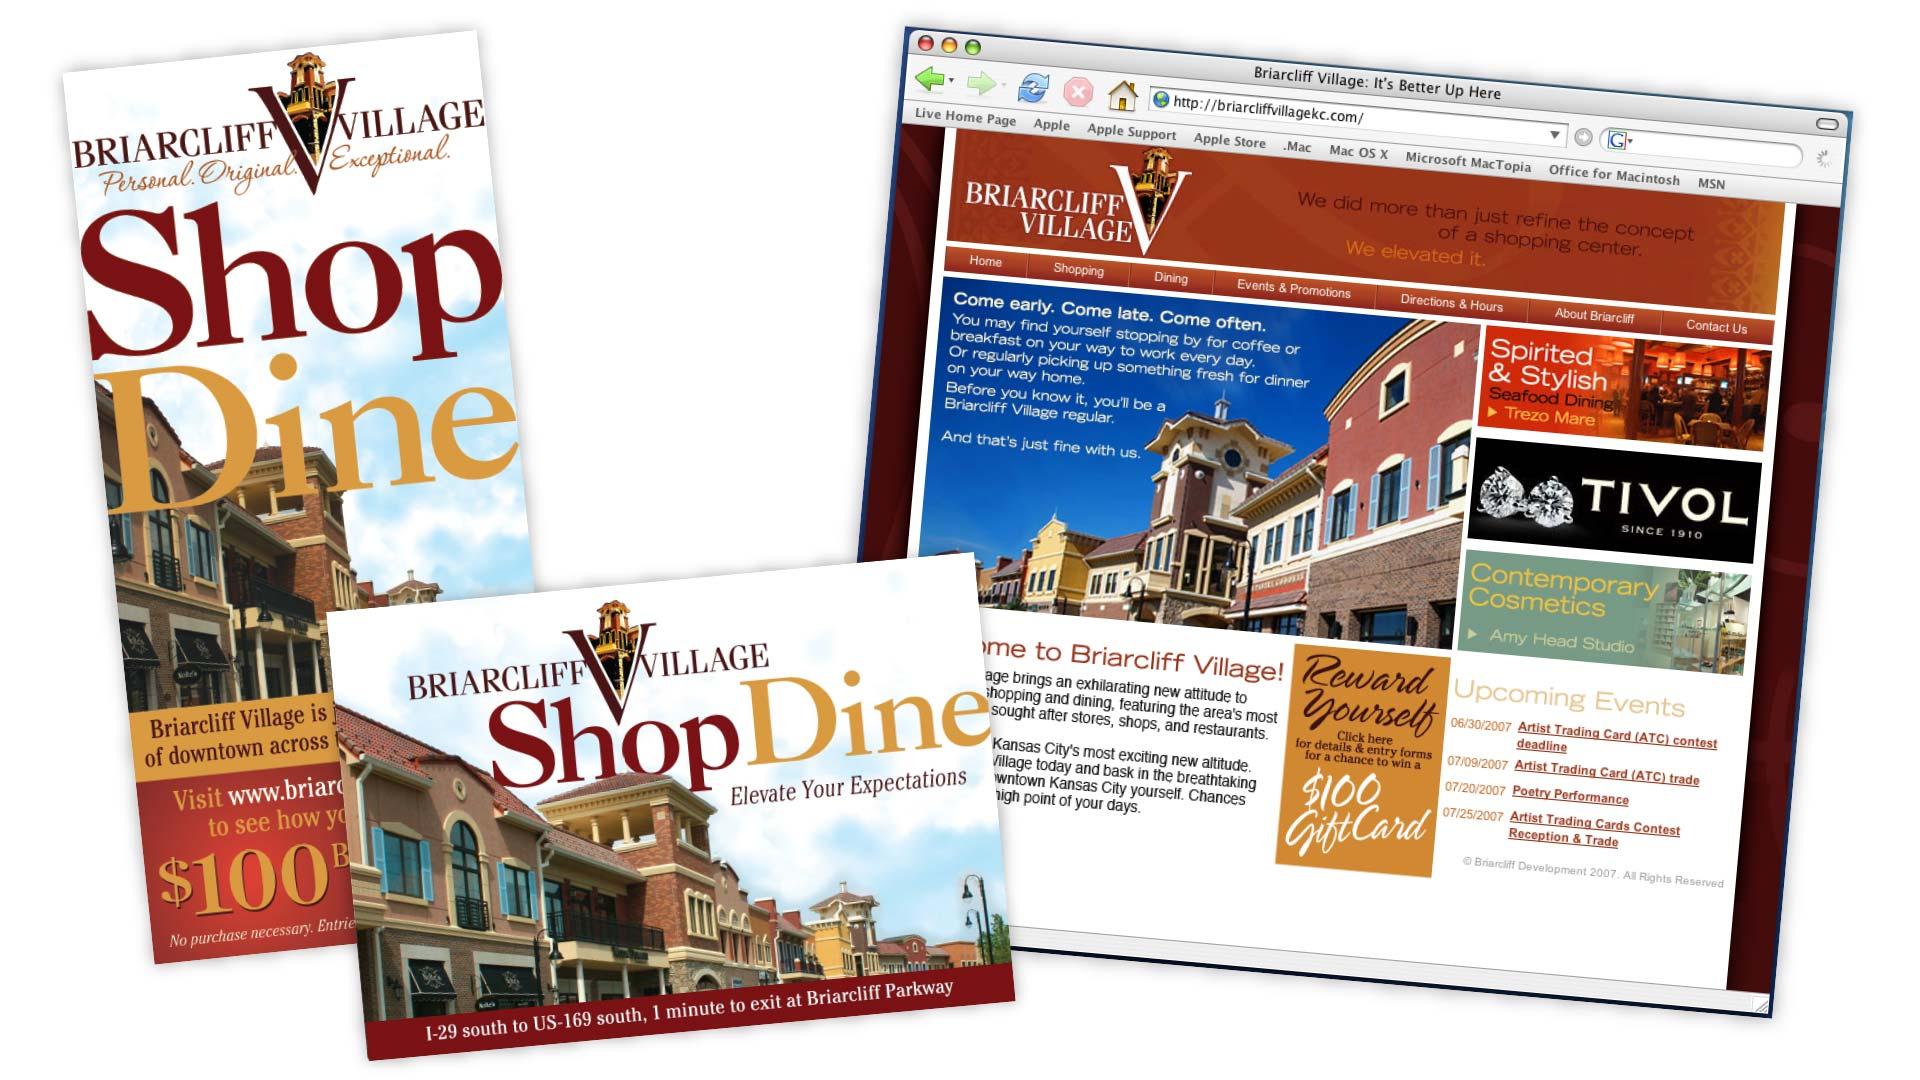 Briarcliff Village - Shop Dine Campaign